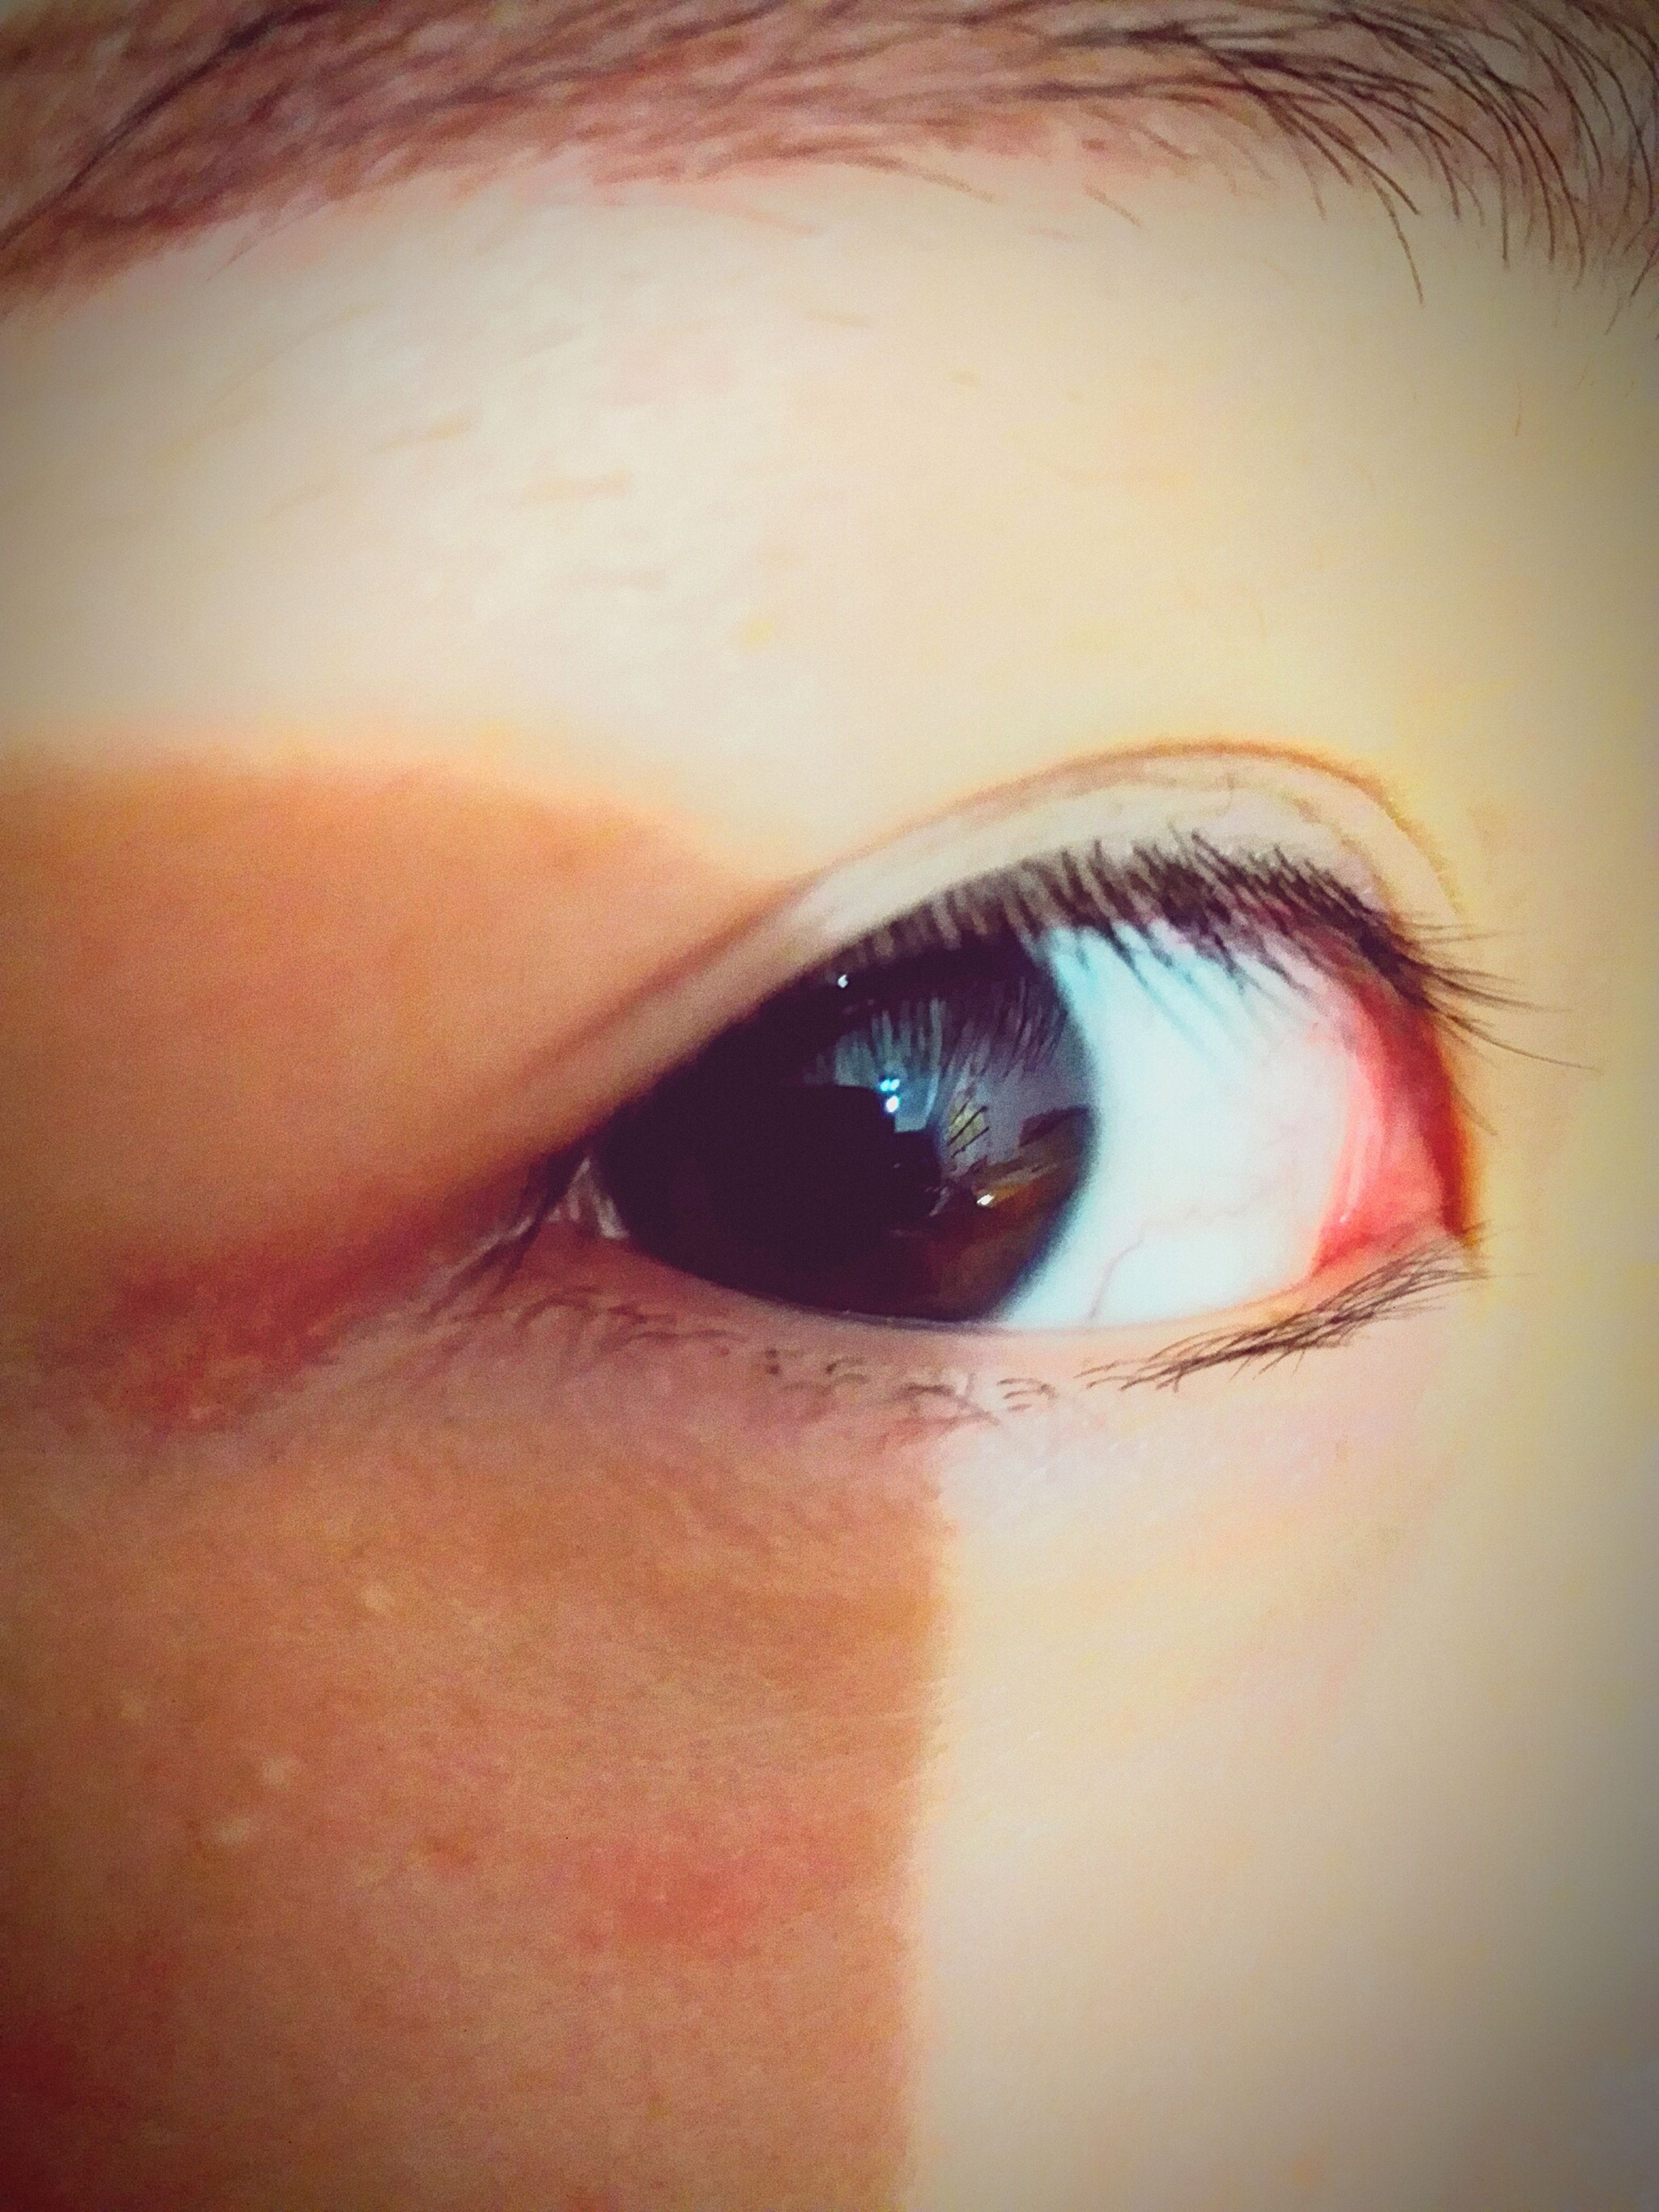 human eye, close-up, indoors, lifestyles, headshot, human face, eyelash, eyesight, looking at camera, portrait, young adult, part of, human skin, leisure activity, sensory perception, reflection, person